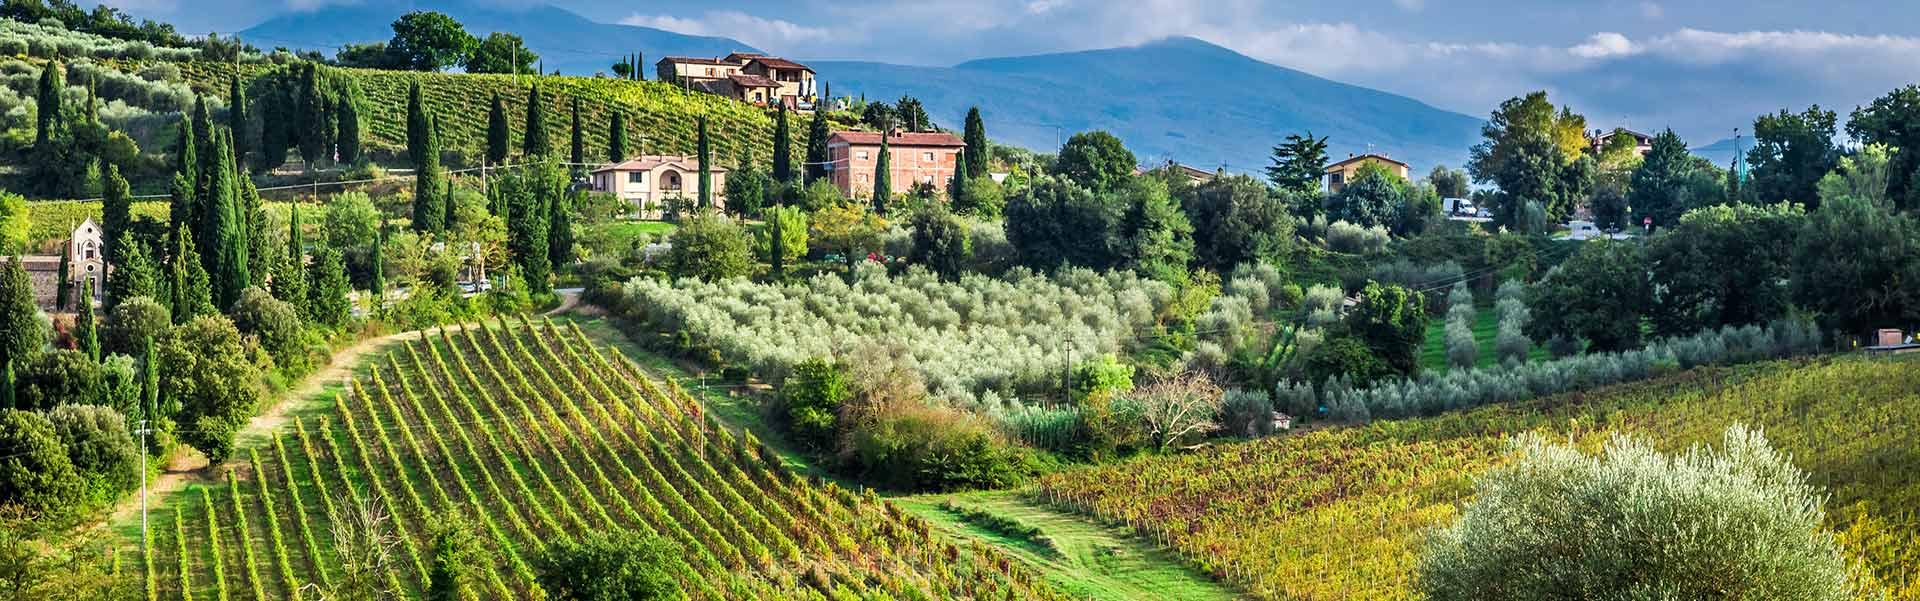 Weinkellerei Meraner Toskana